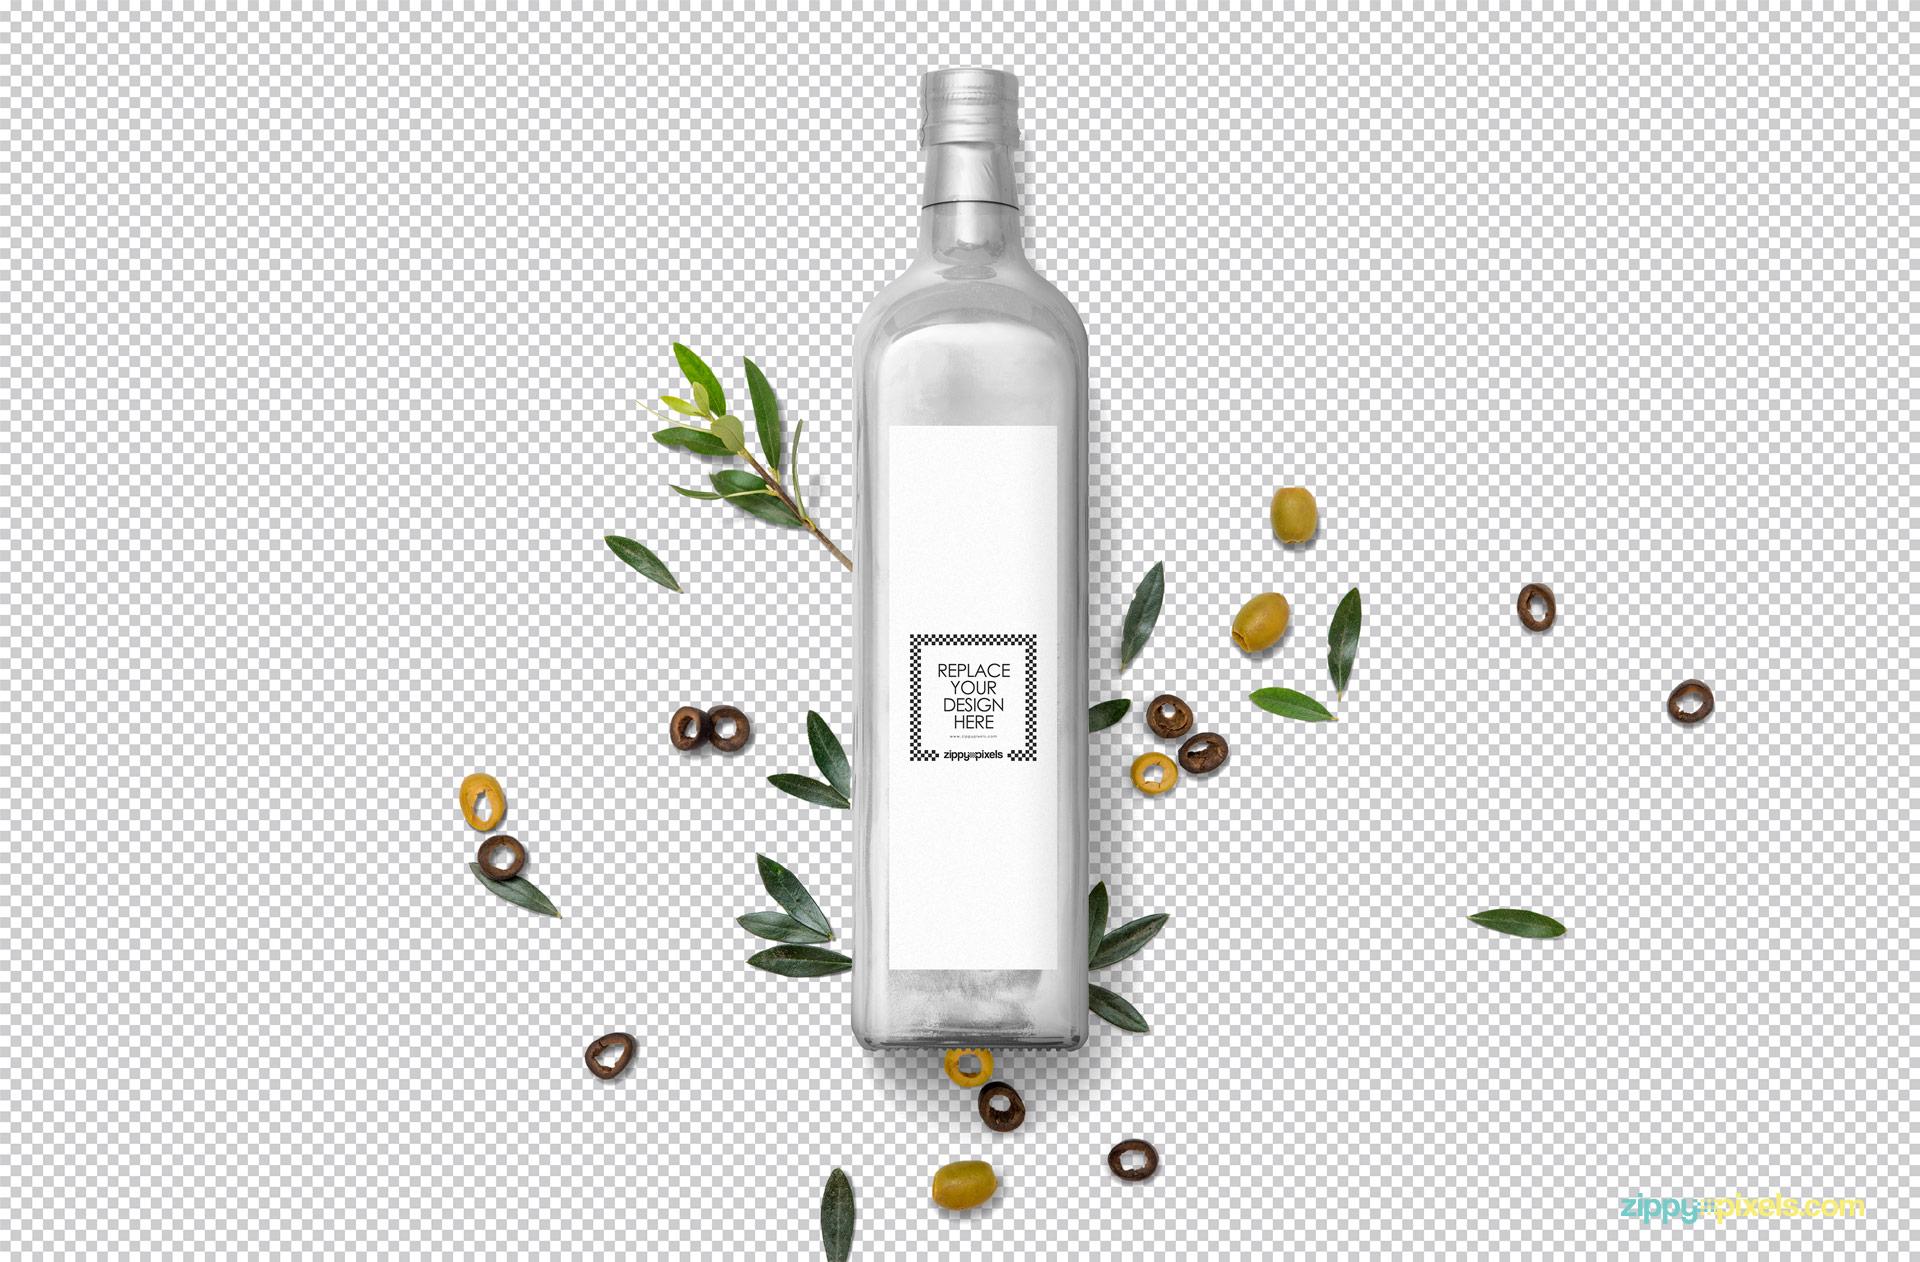 Free Customizable Glass Bottle Mockup | ZippyPixels